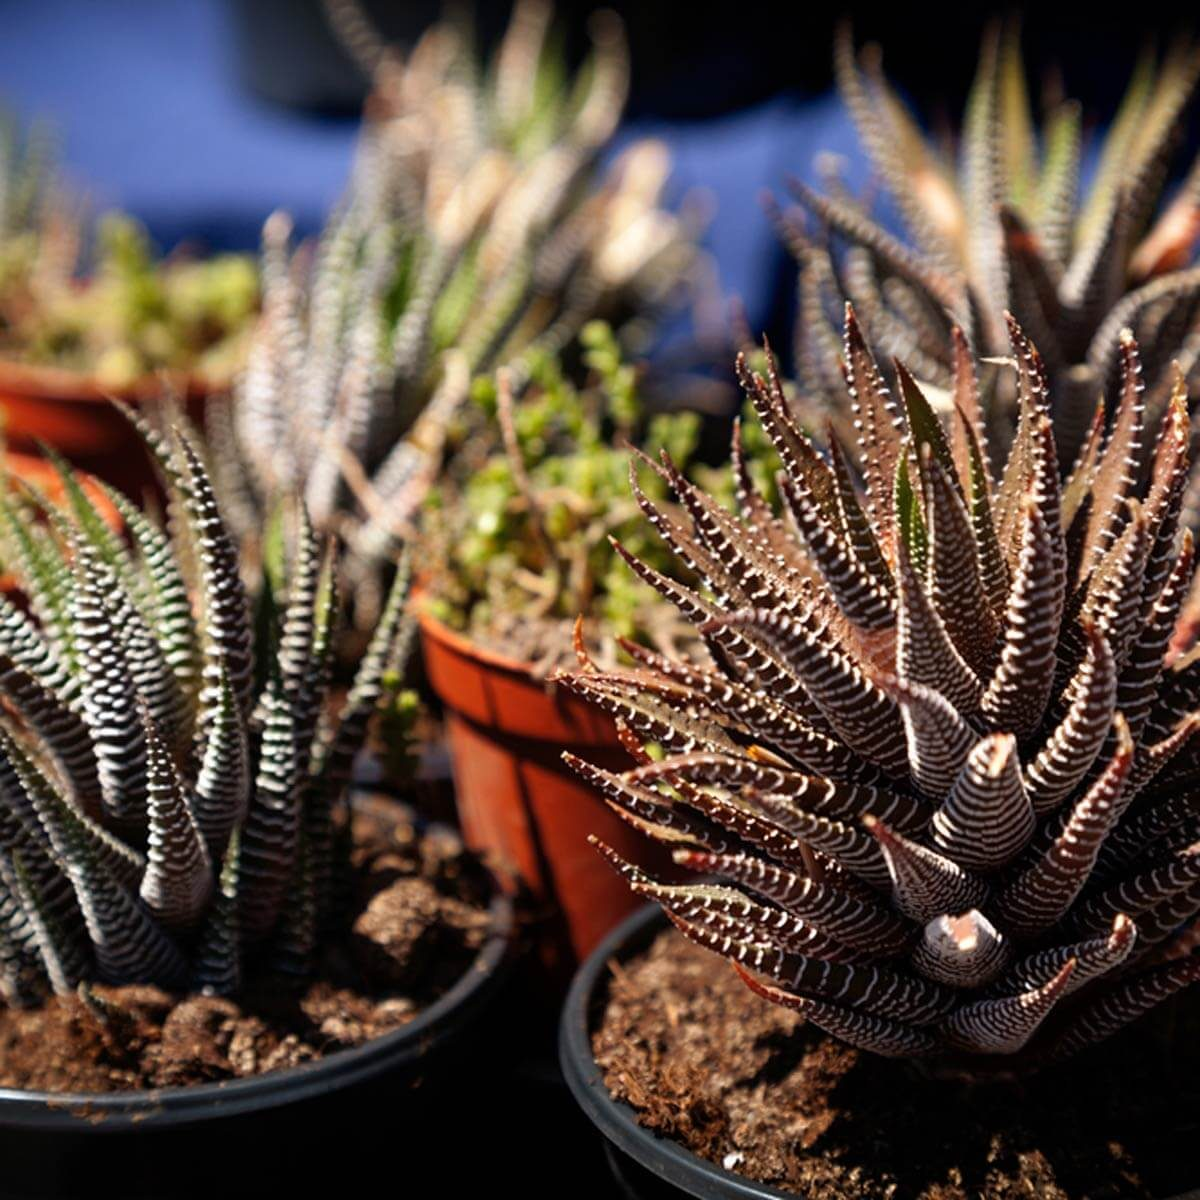 dfh12_shutterstock_651497608 succulents cactuses